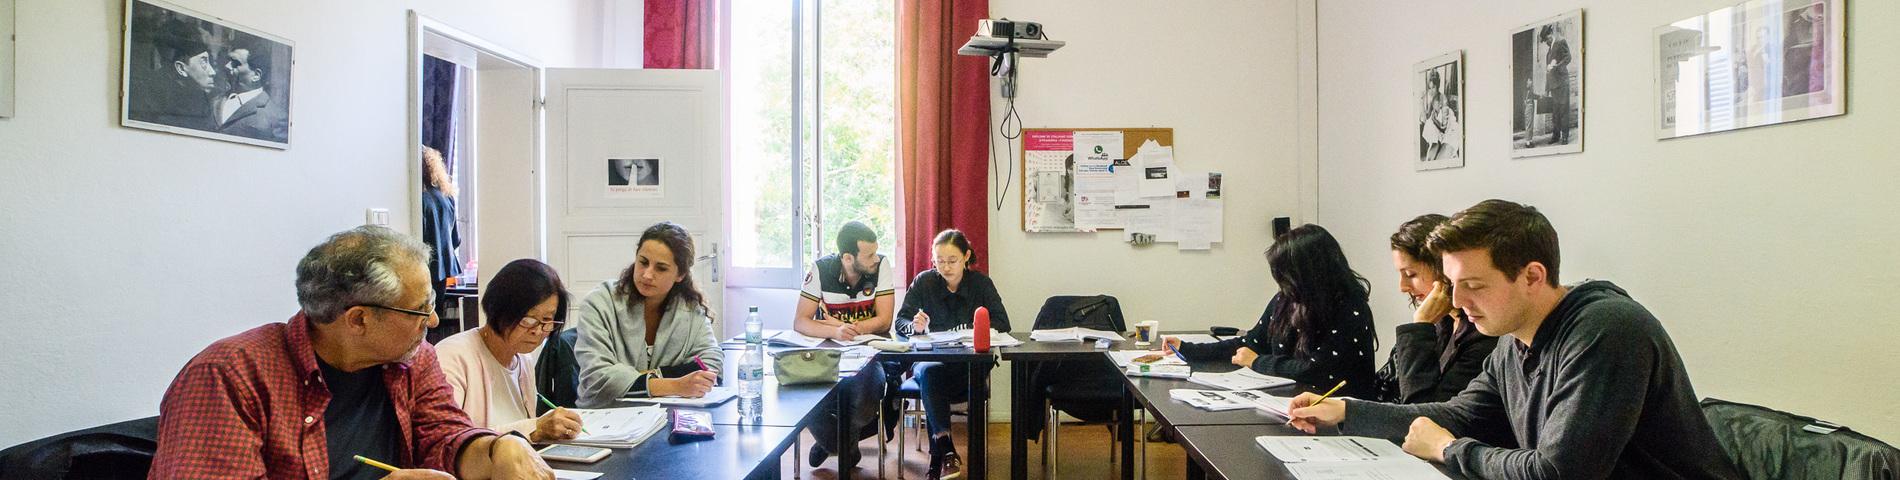 A.L.C.E. Accademia Lingue e Culture Europee resim 1